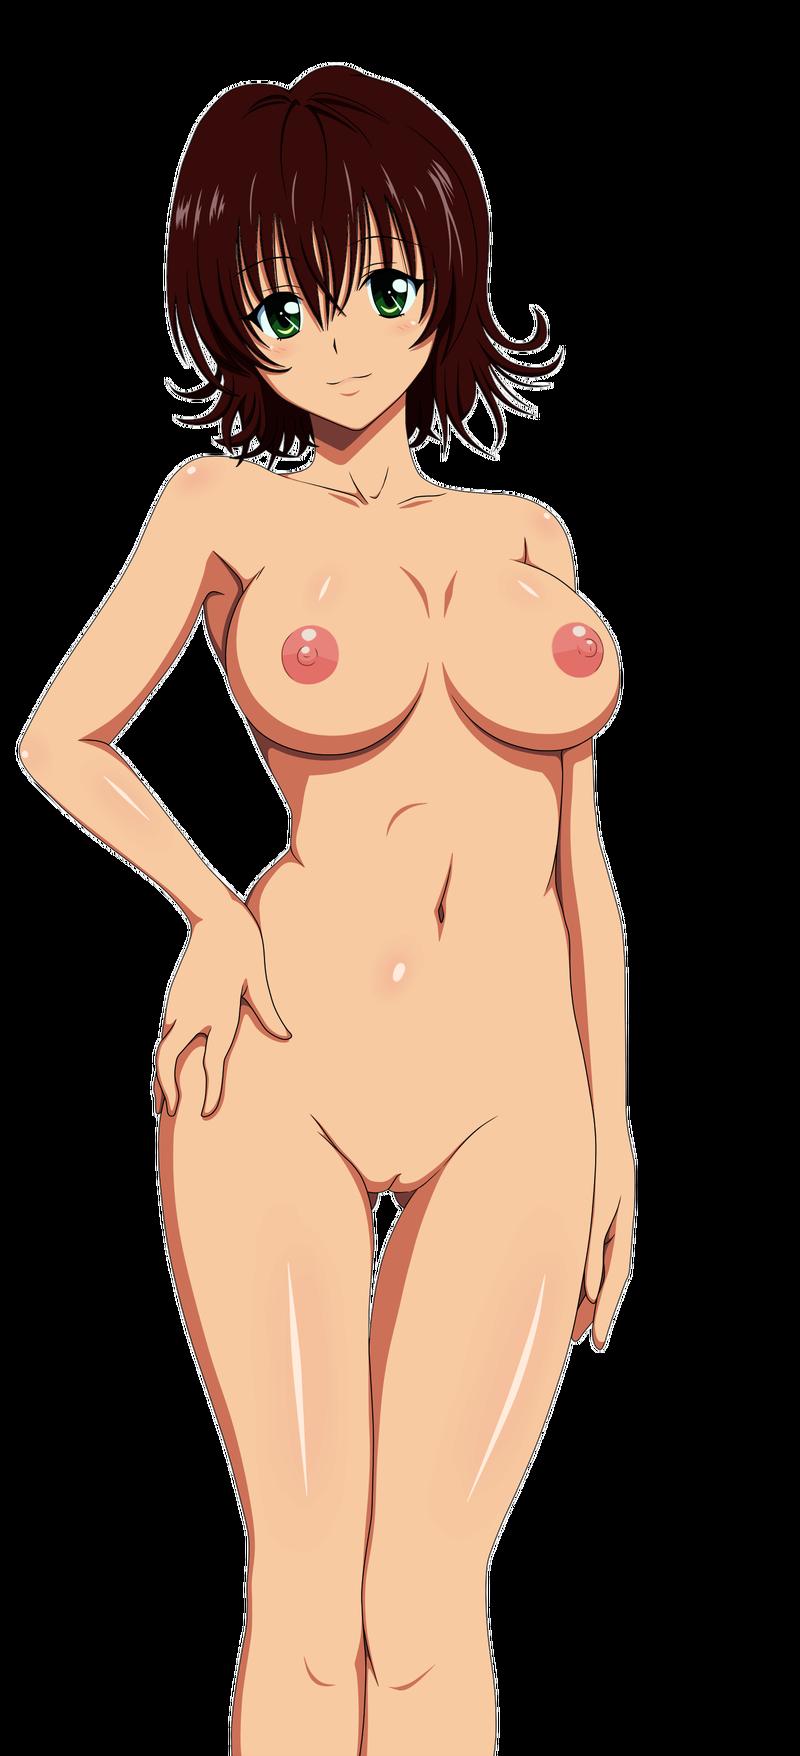 Mikan Yuuki Haruna Sairenji Lala Satalin Deviluke Yui Kotegawa Ren/Run Elsie Jewelria Ryoko Mikado Momo Belia Deviluke  Nana Astar Deviluke  Golden Darkness 747666 - Ryouko_Mikado To_LOVE-Ru.png